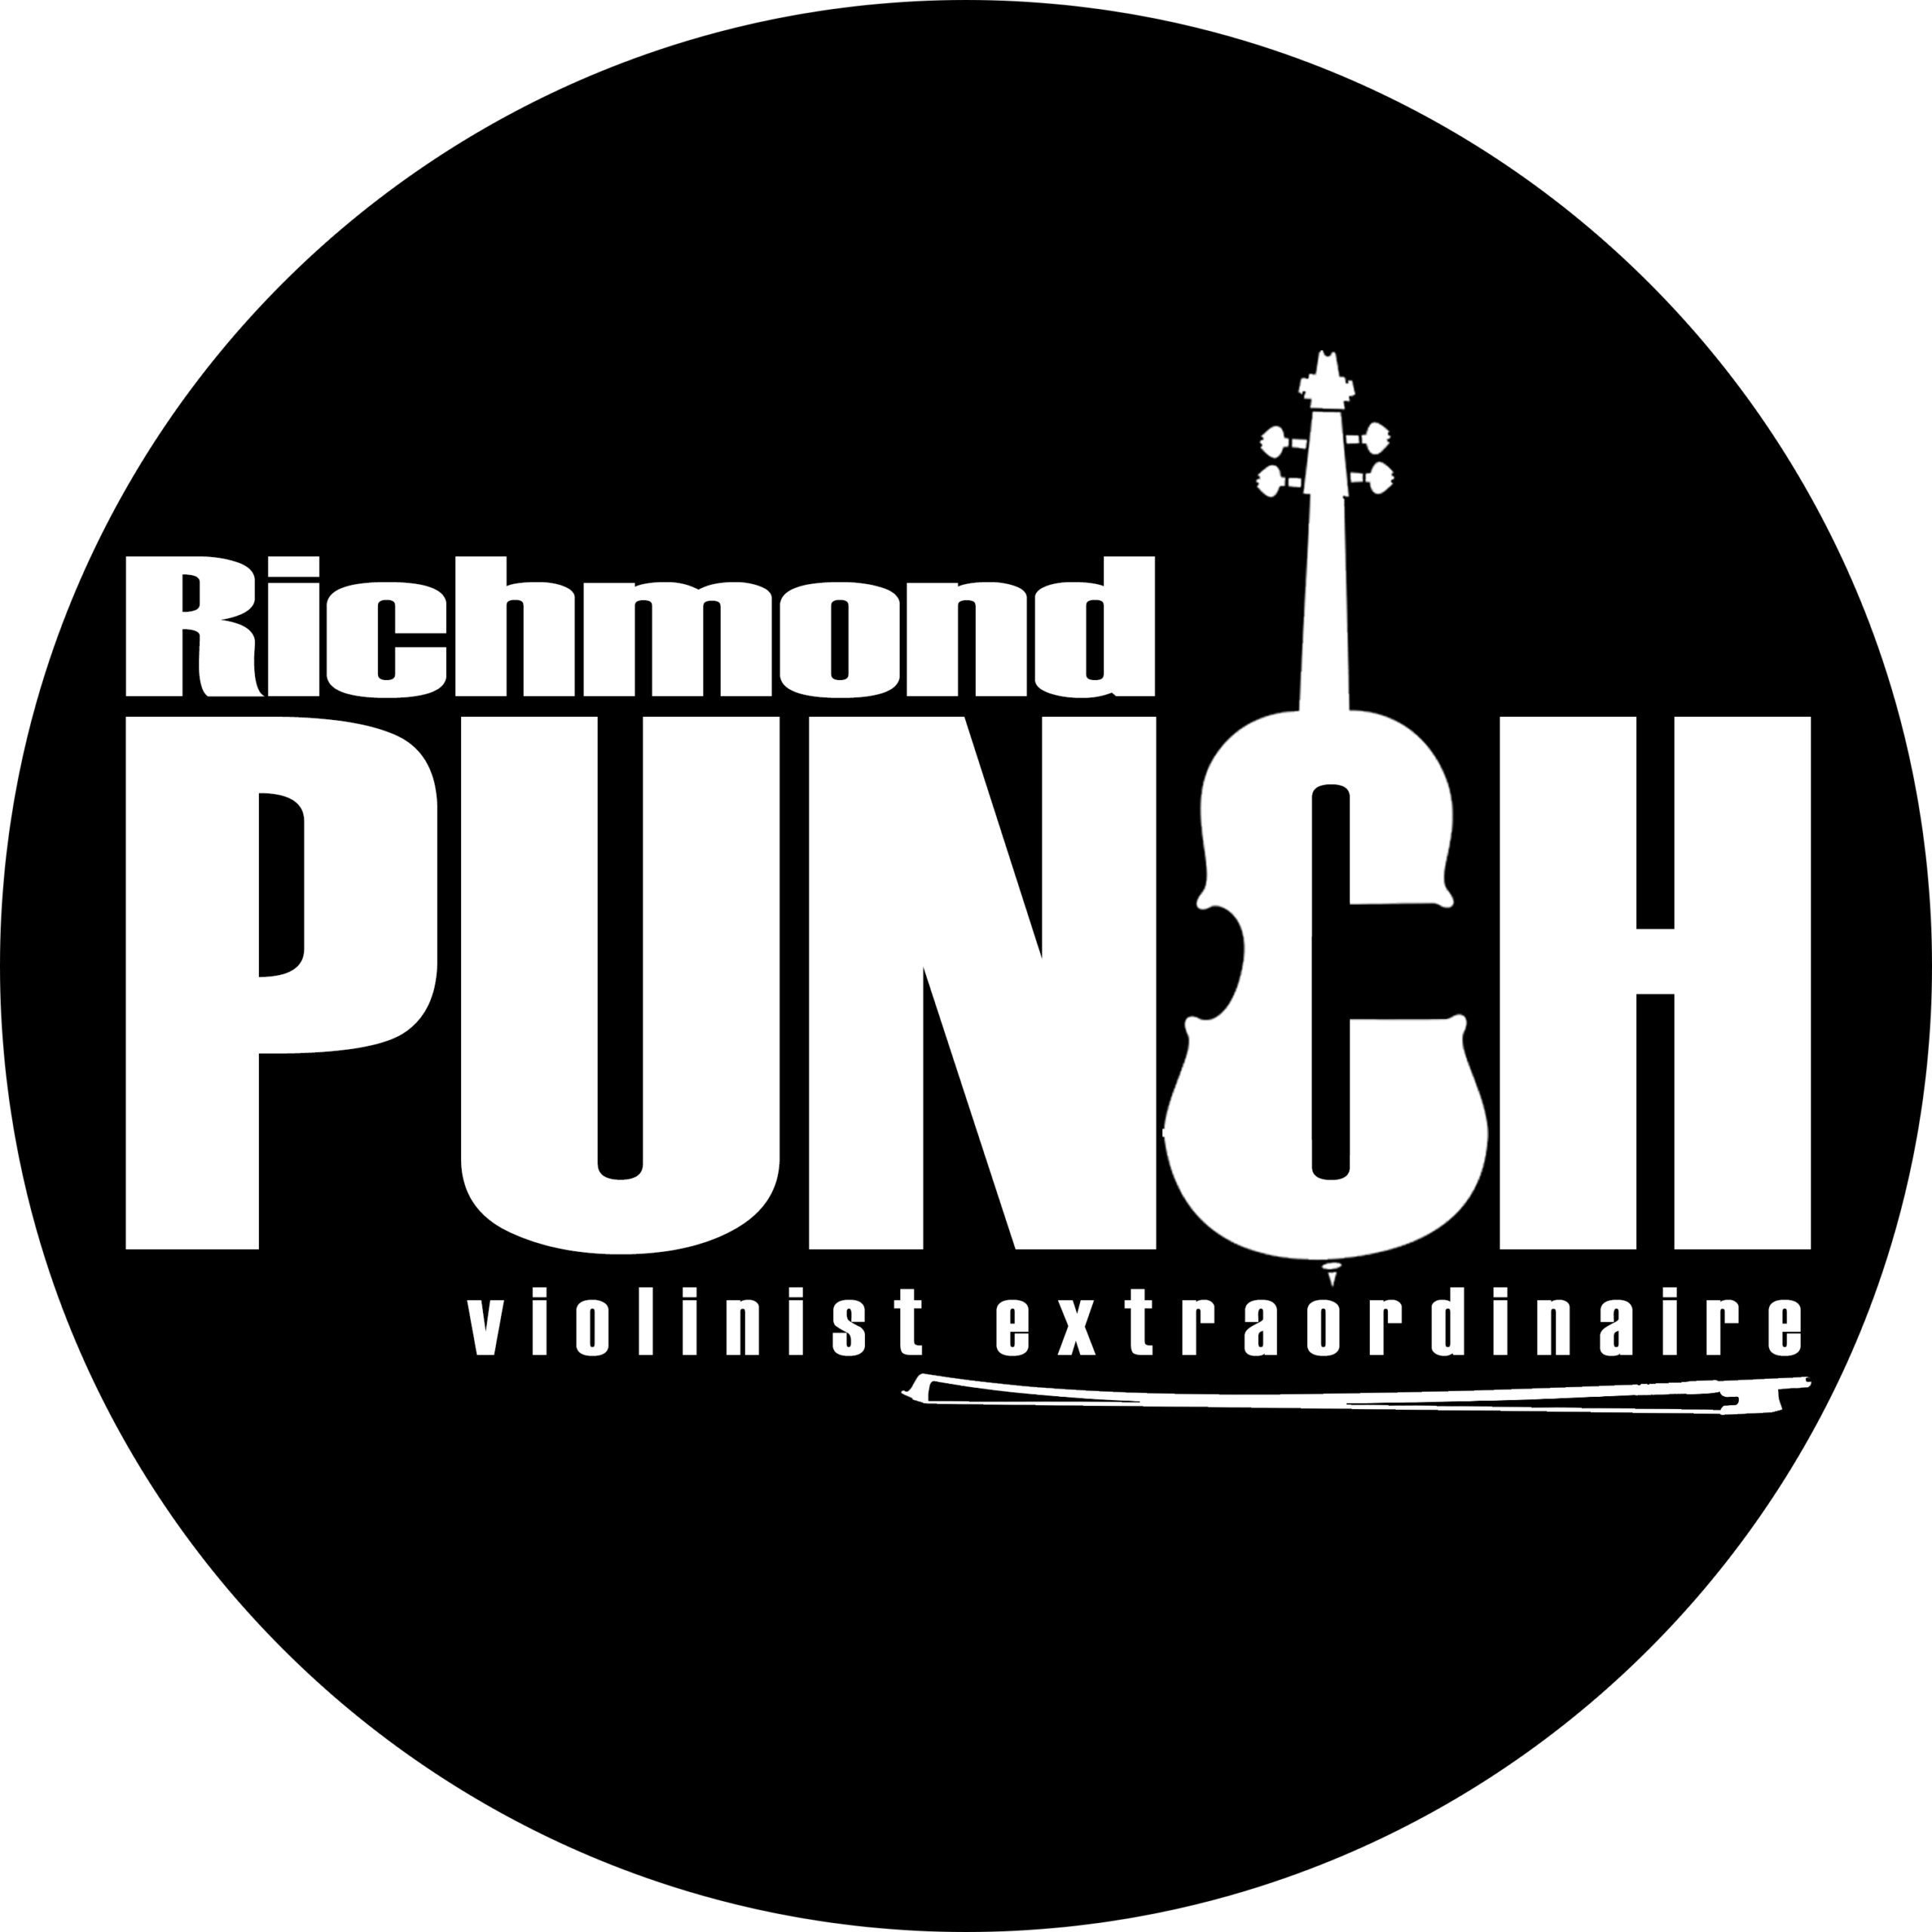 RICHMOND PUNCH